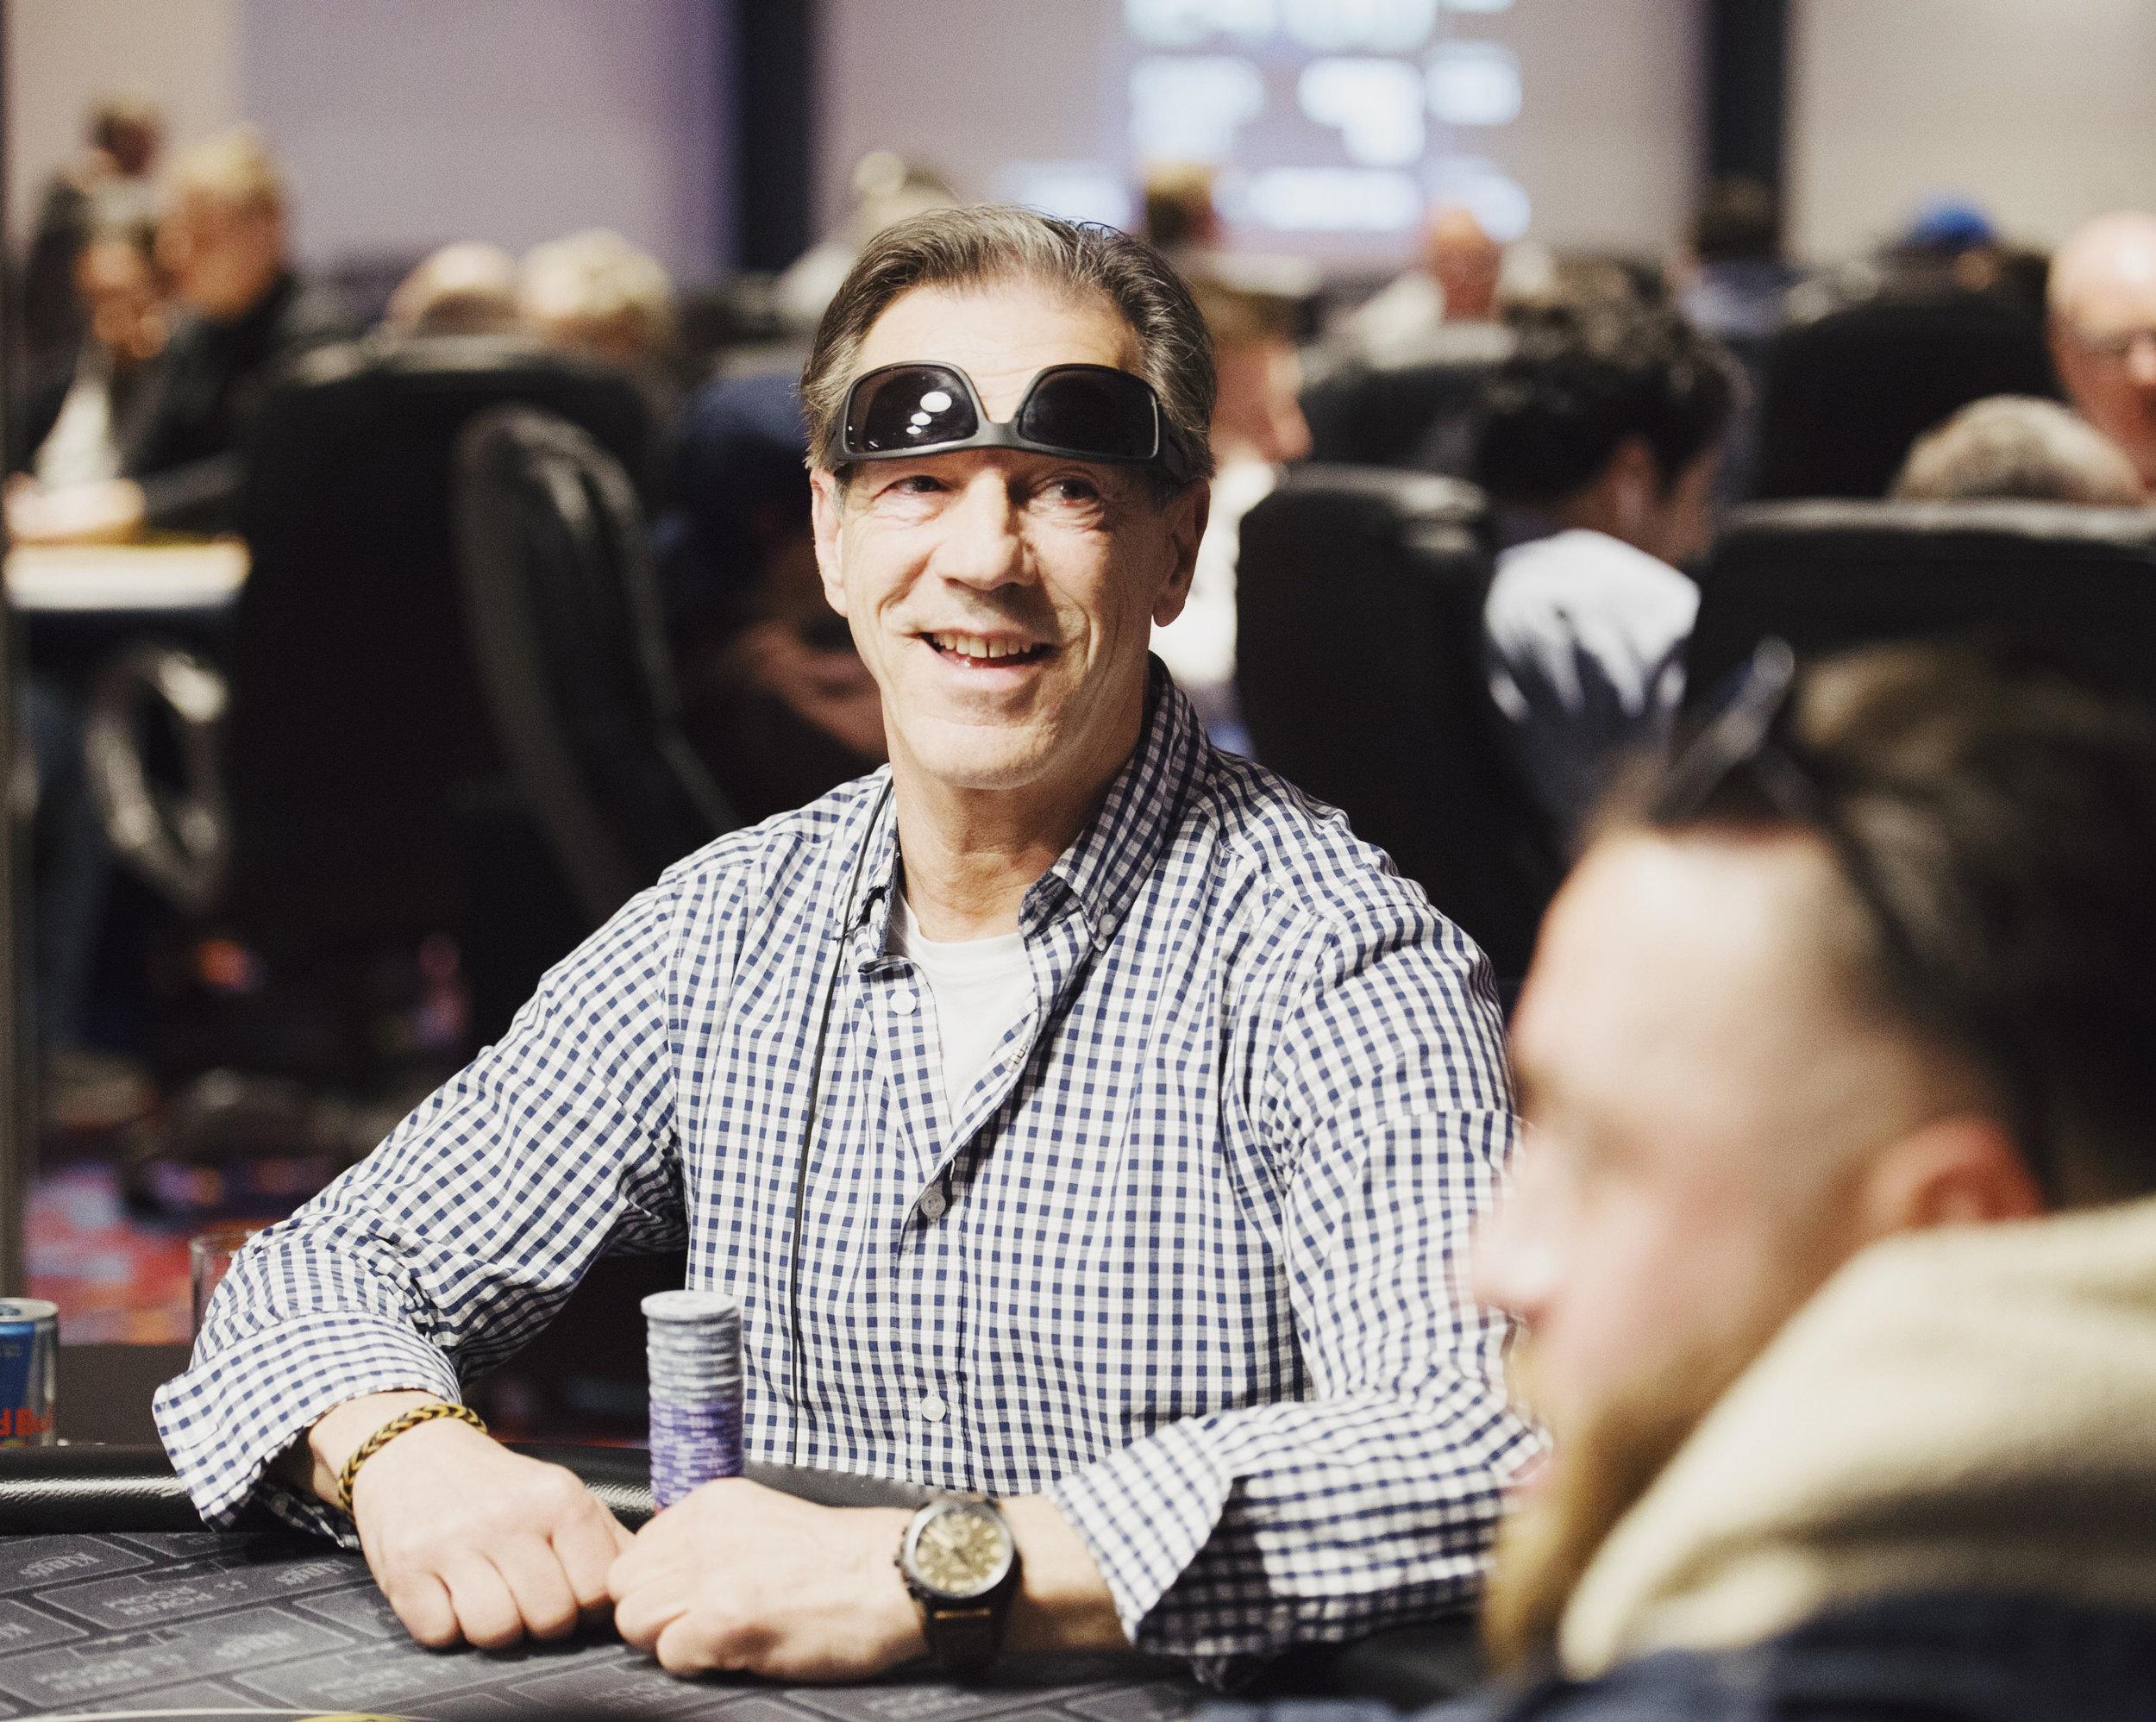 polina-shubkina-poker-020.JPG